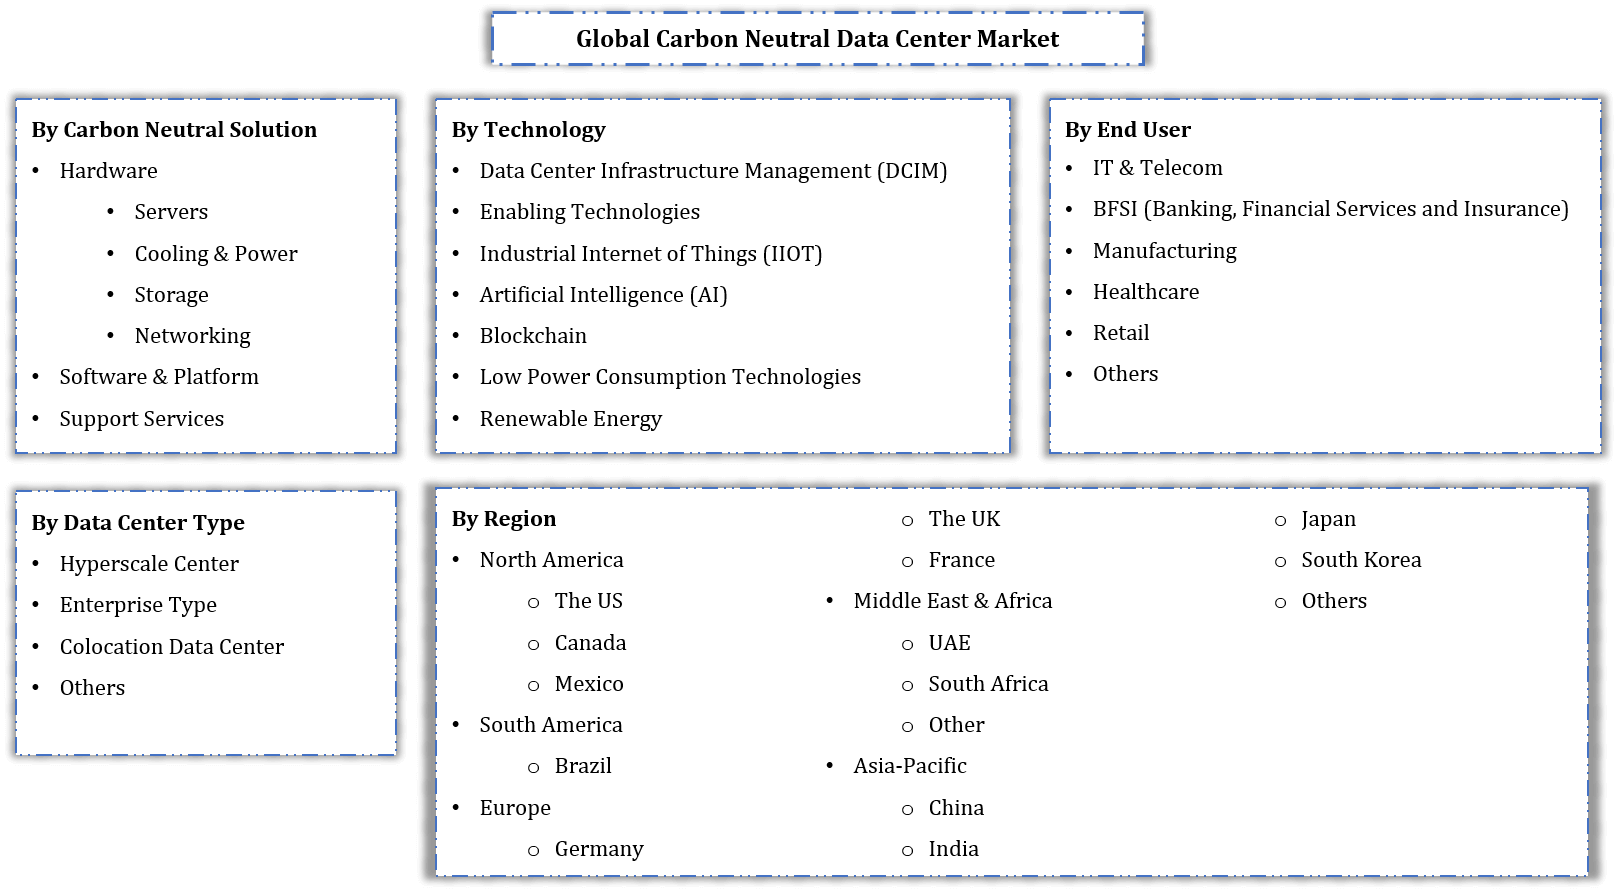 Global Carbon Neutral Data Centers Market Segmentation